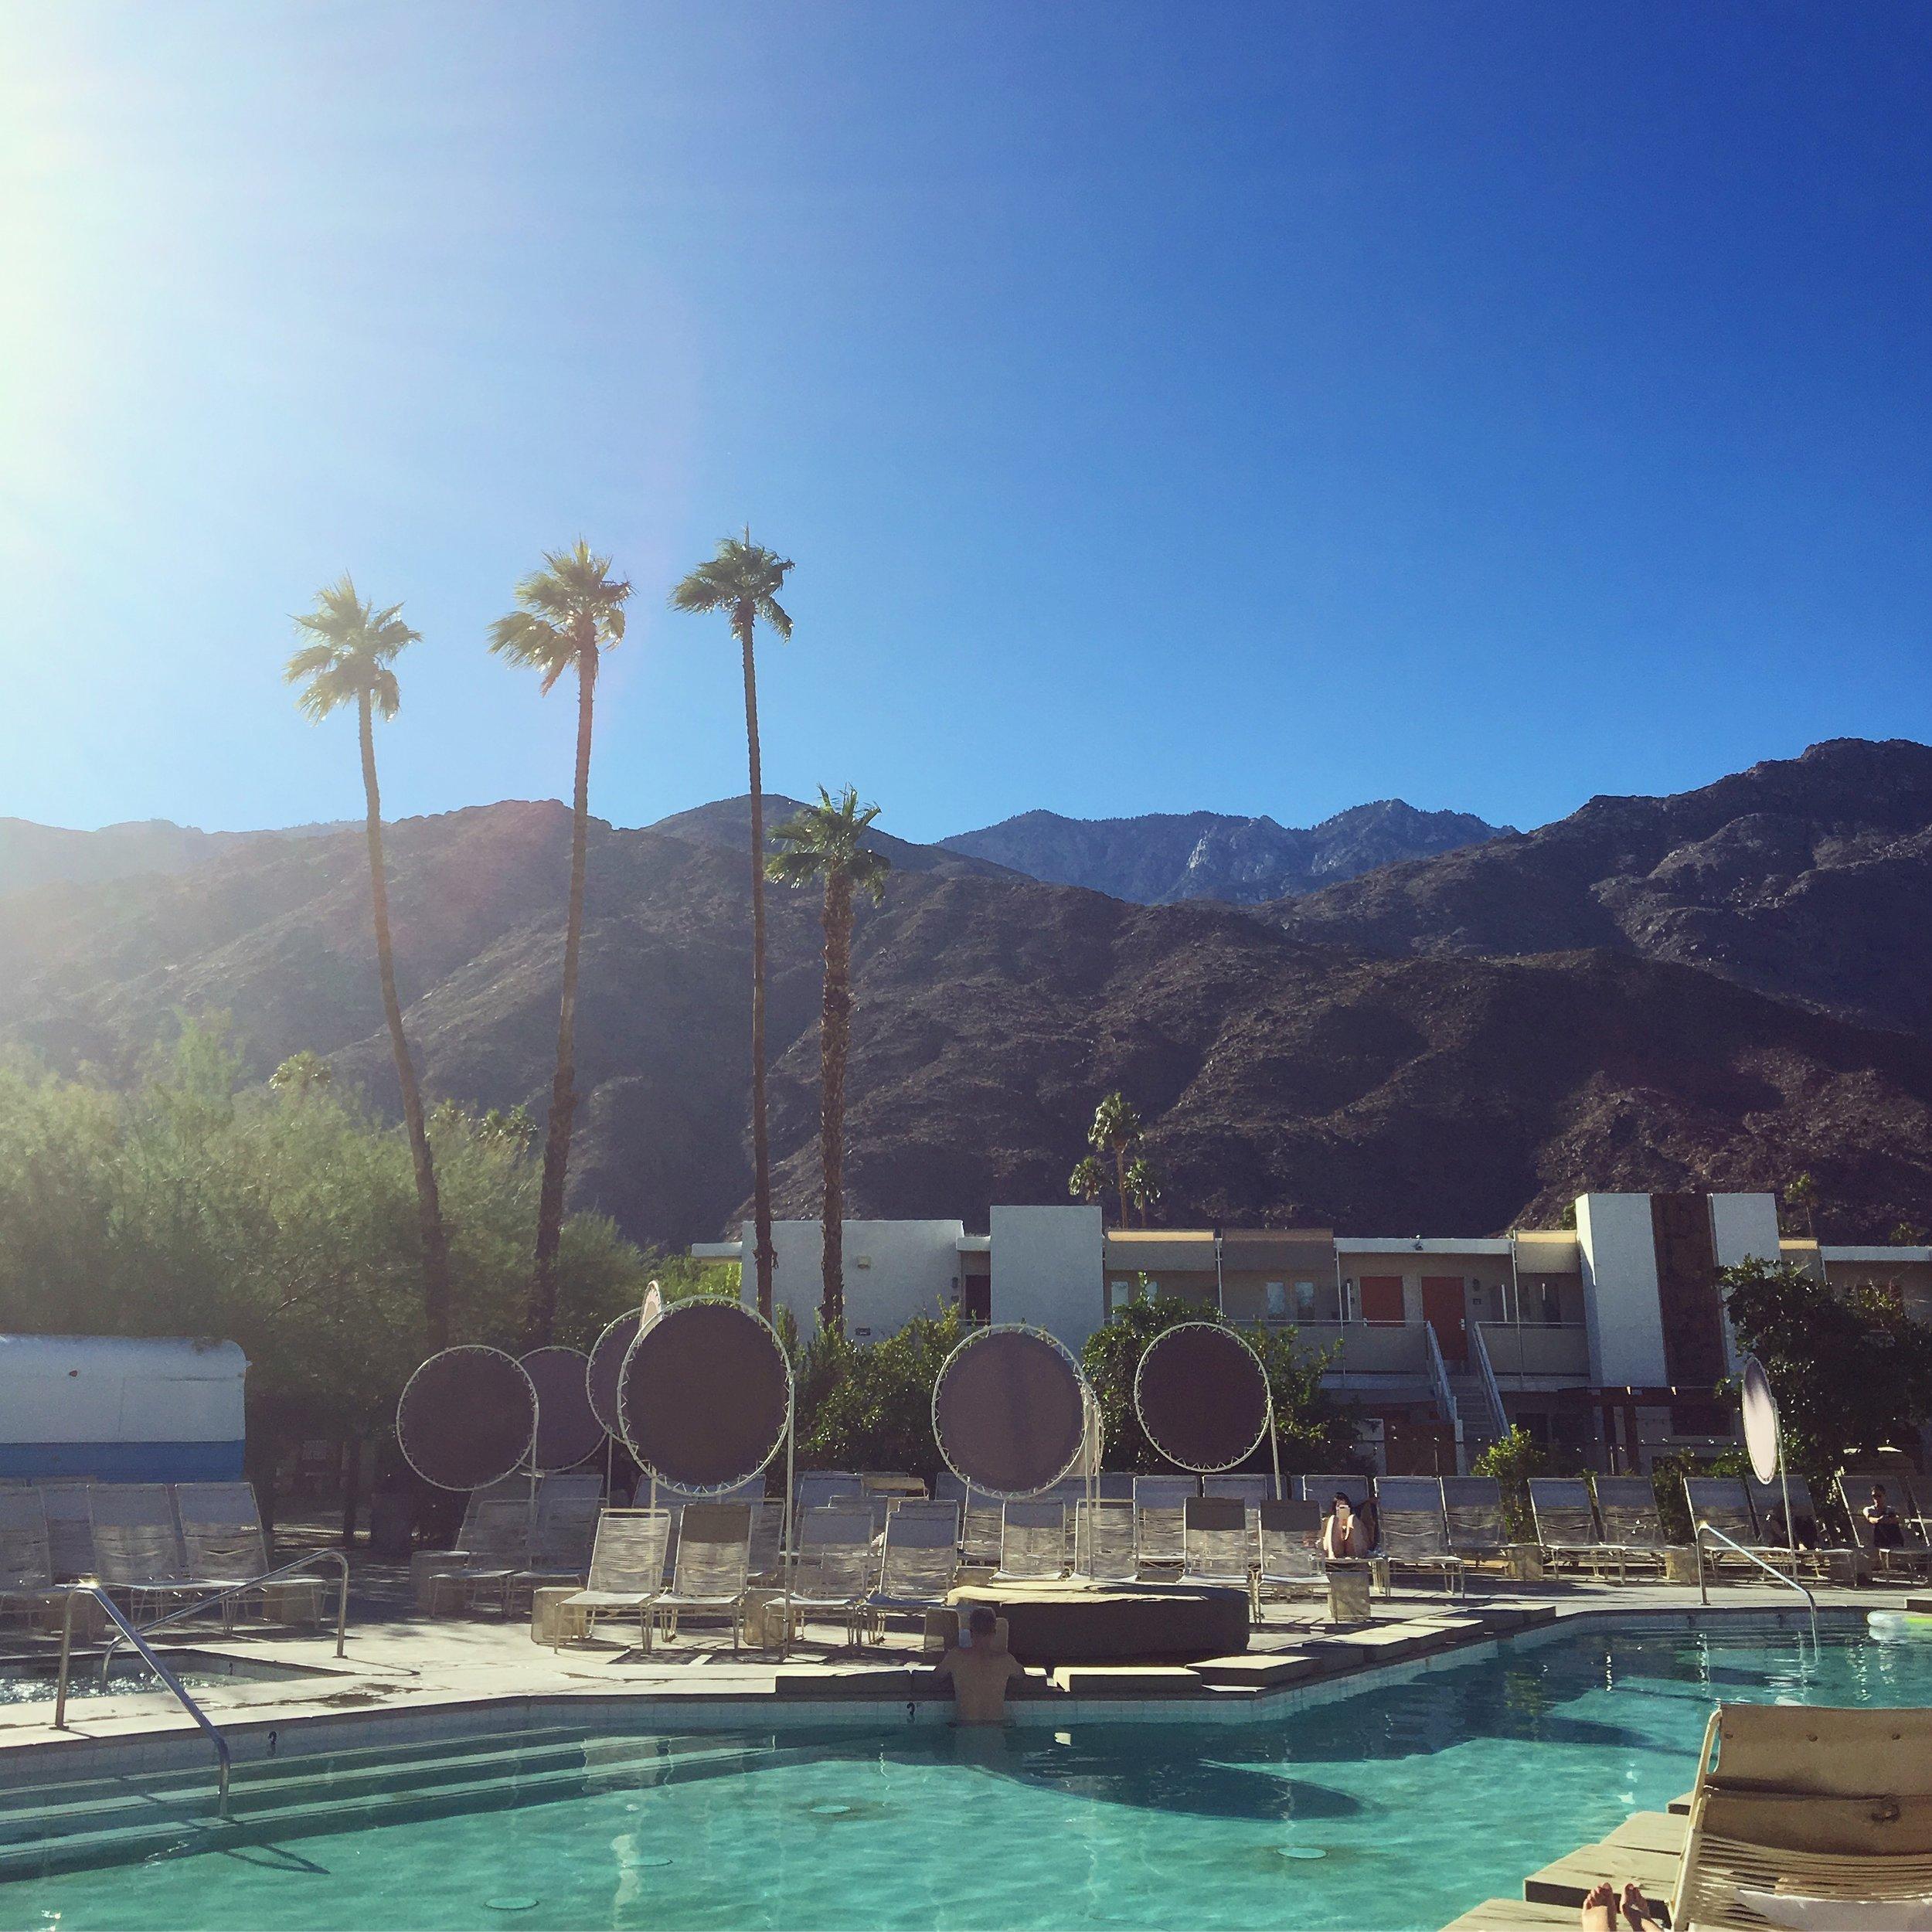 V23_Creative_Co_Designer_Vaca_Ace_Hotel_Palm_Springs_California_01.jpg